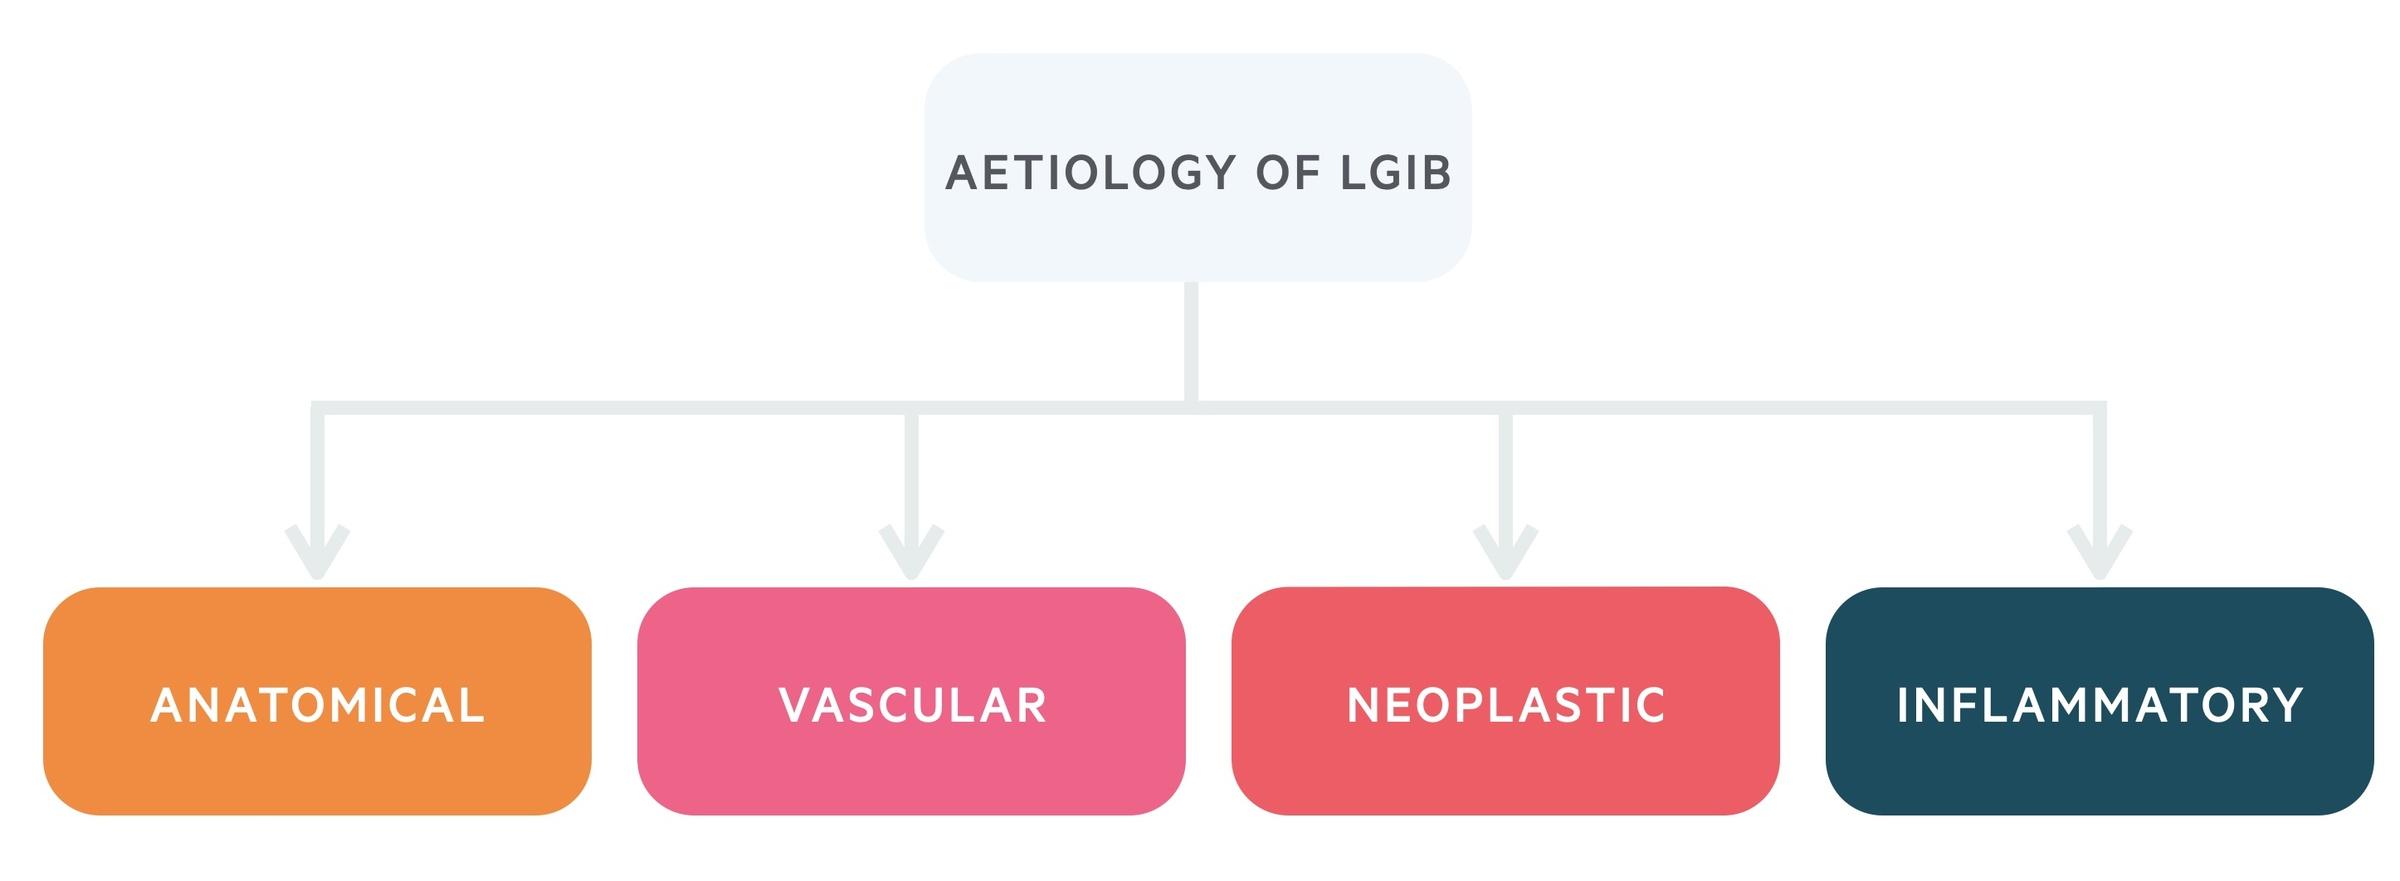 Aetiology of lower GI bleed (LGIB)